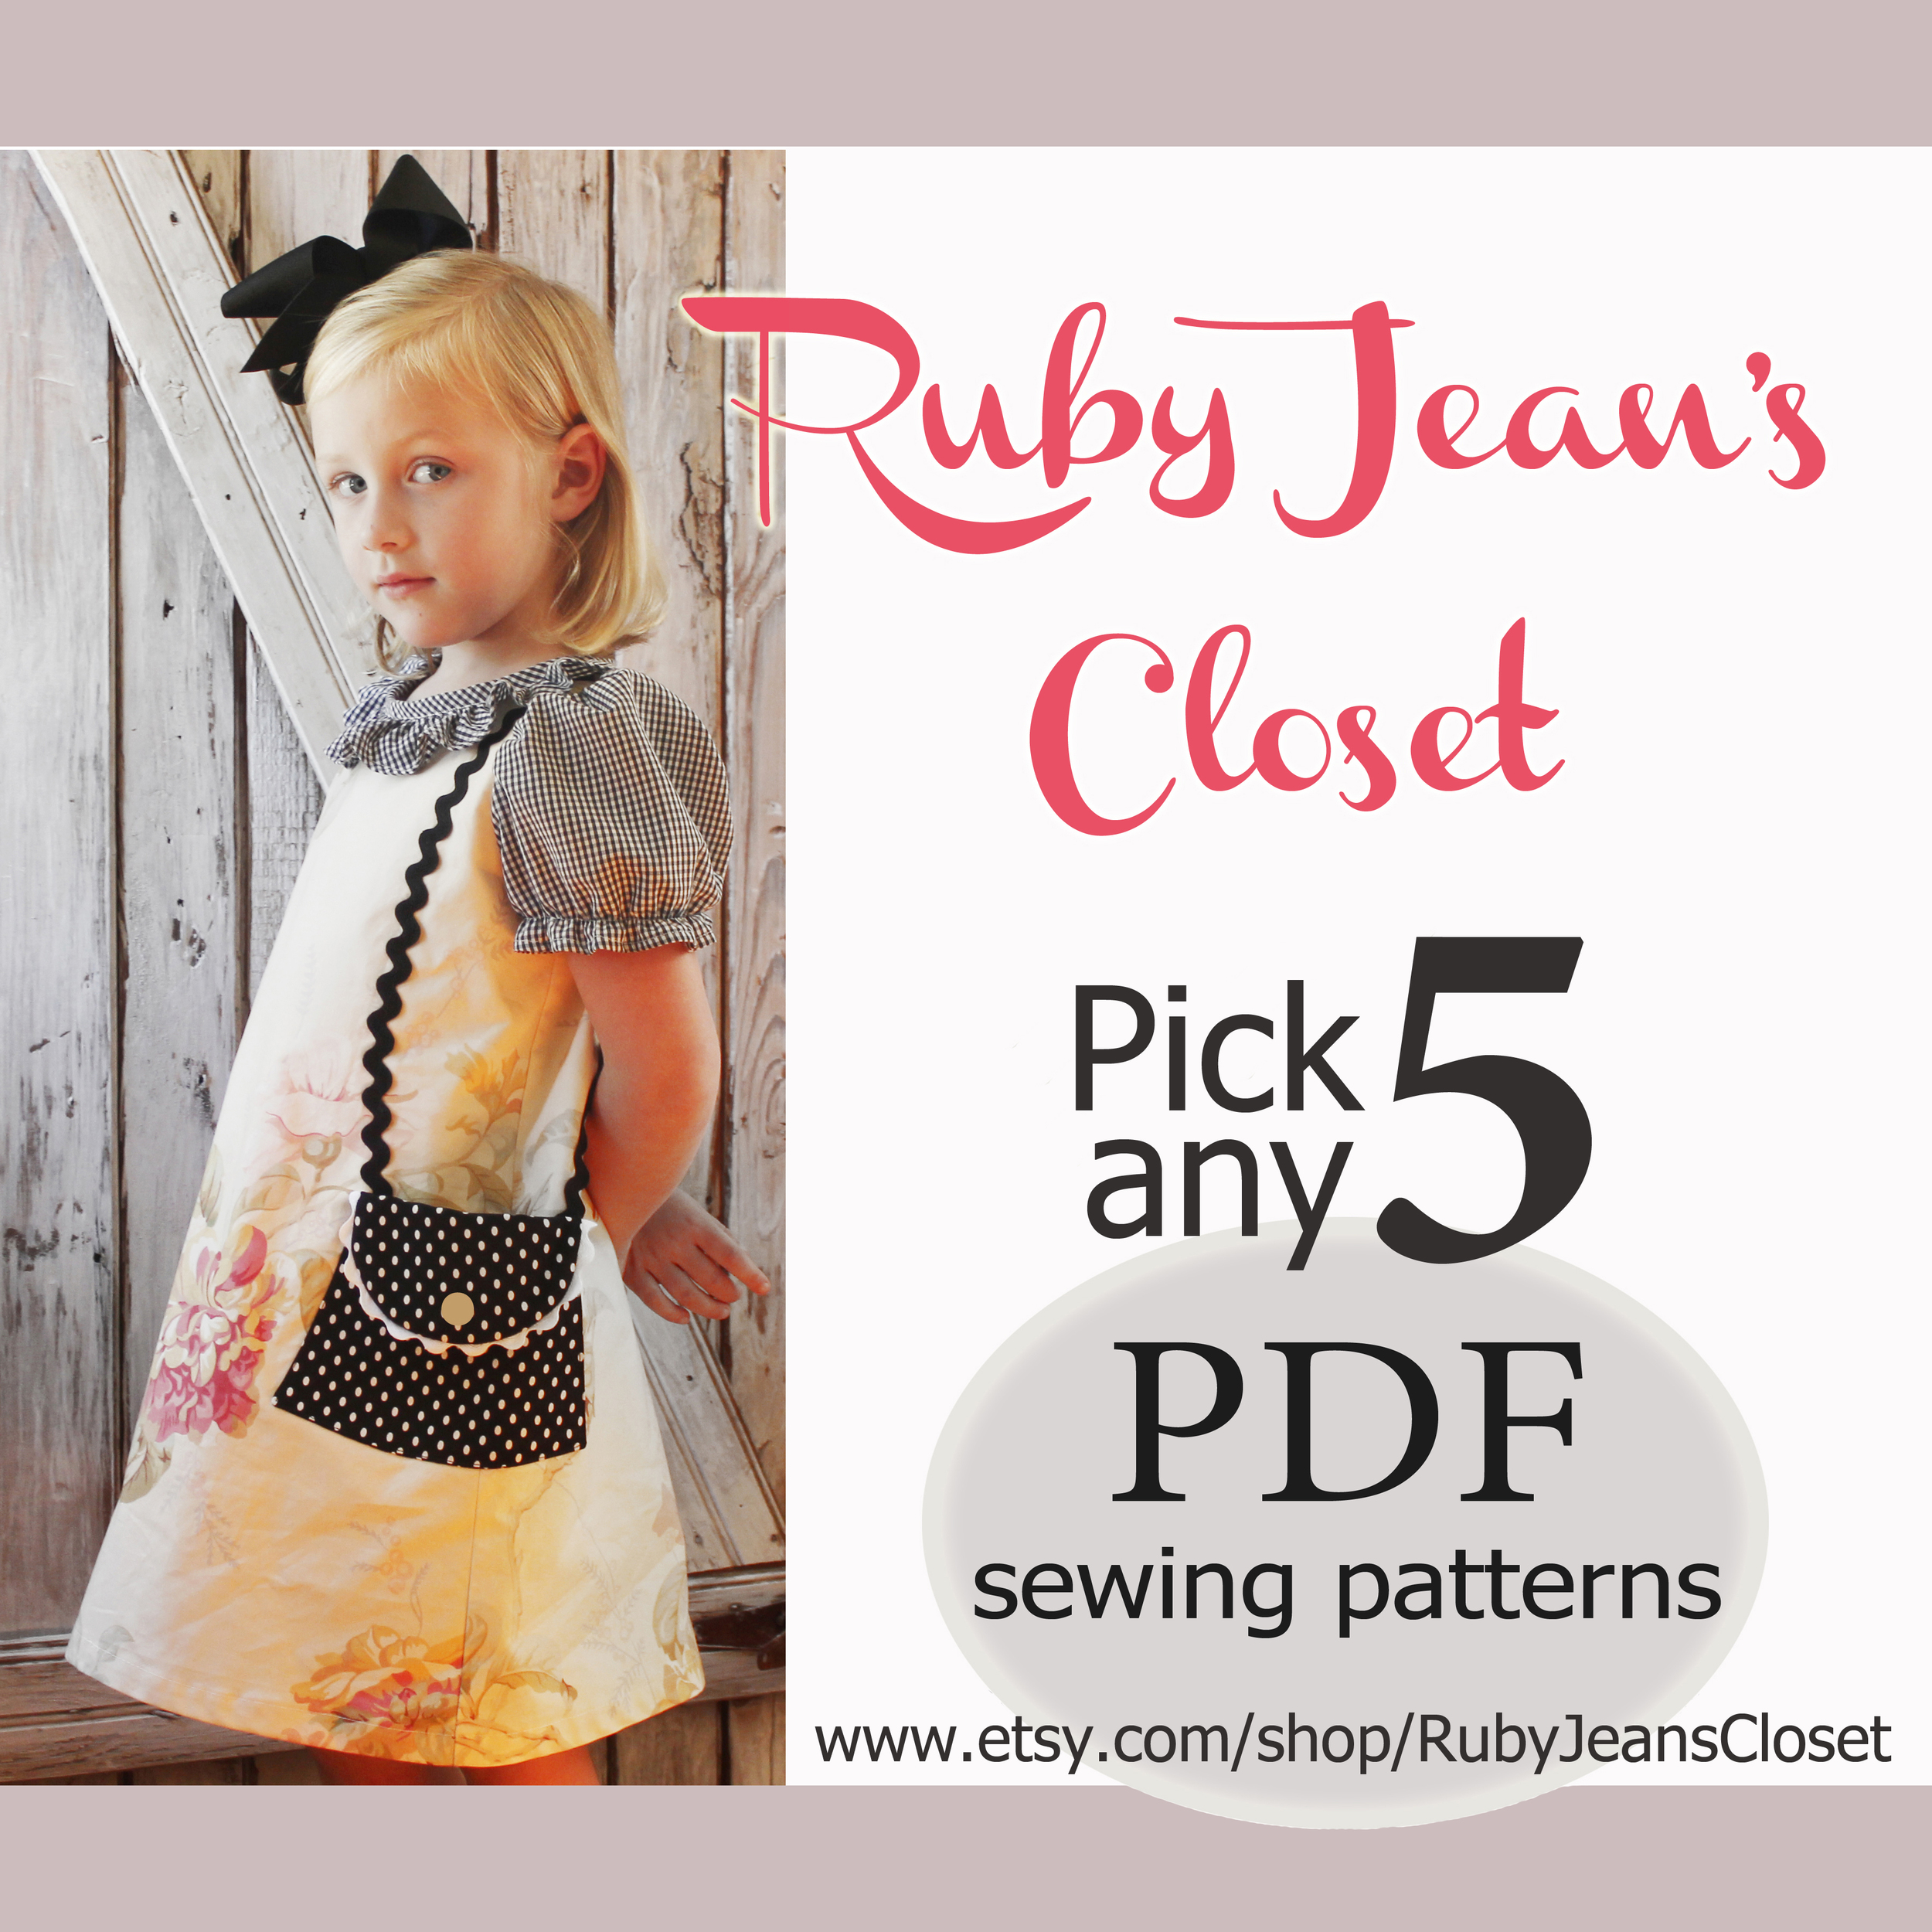 Ruby Jean's Closet